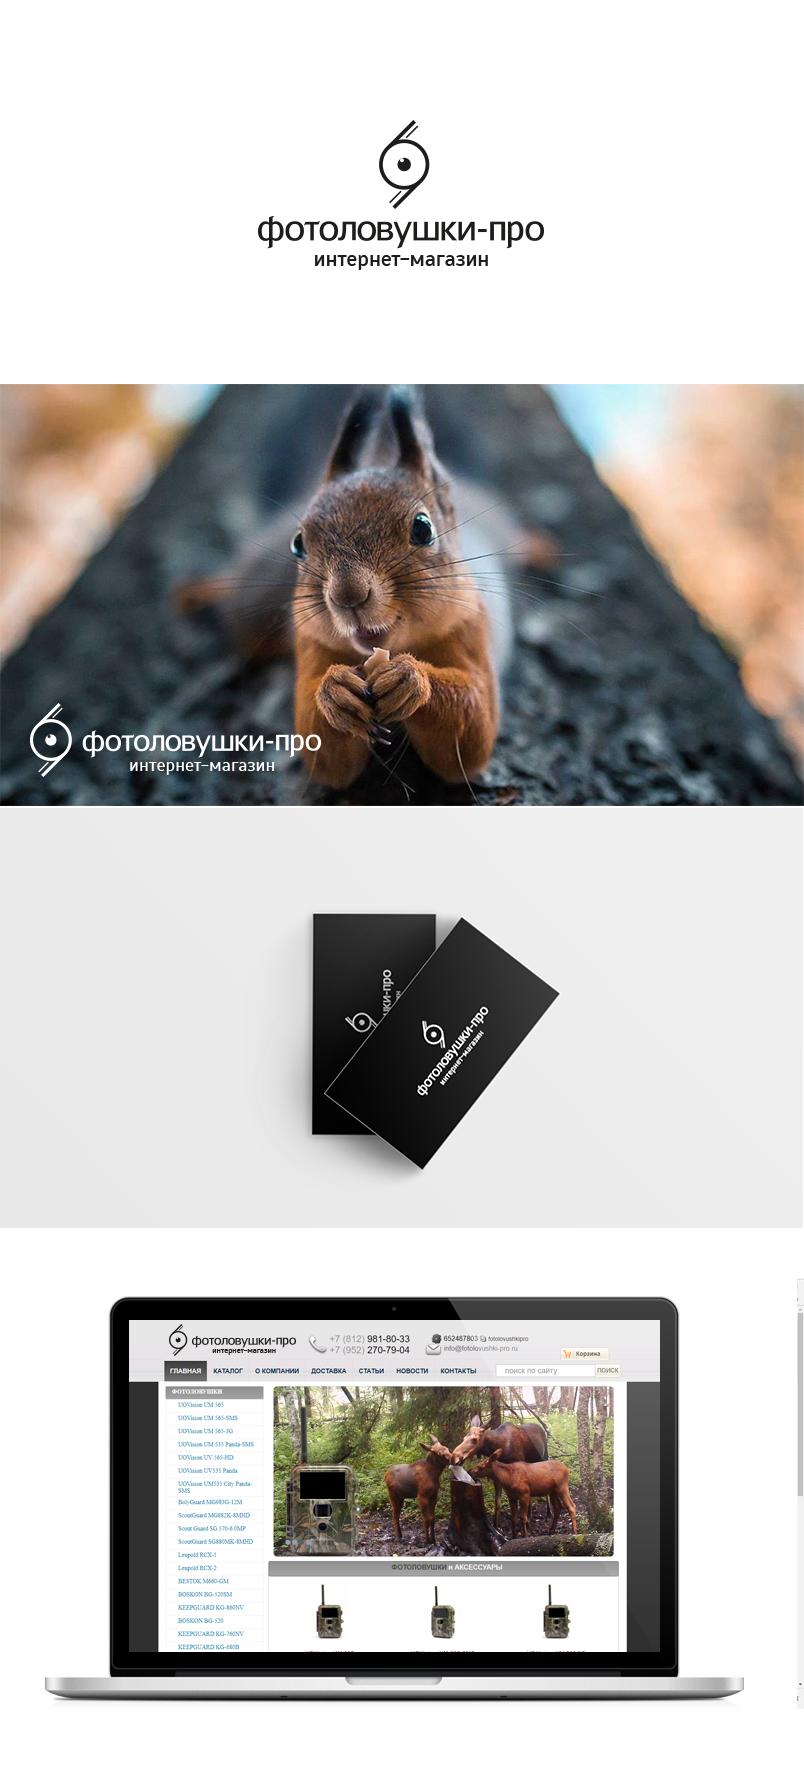 Логотип для интернет-магазина фототехники